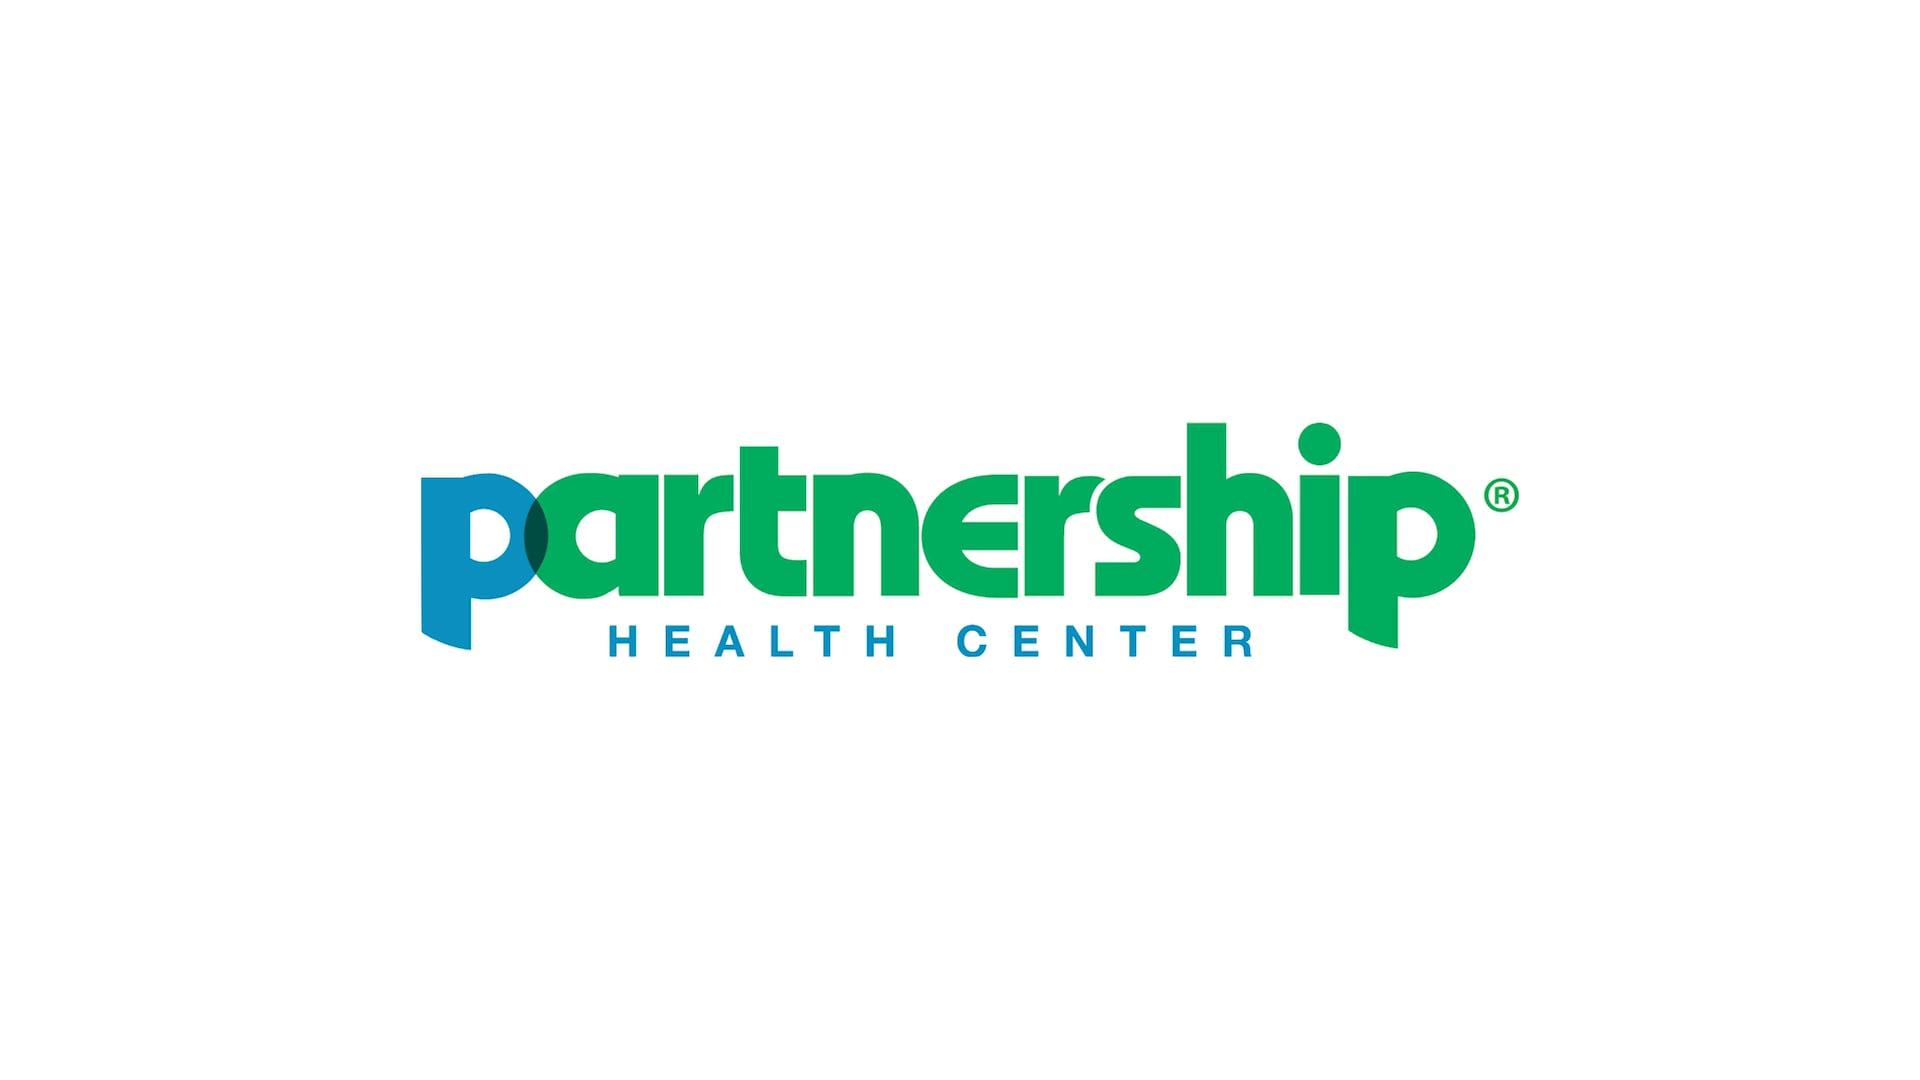 Partnership Health Centers